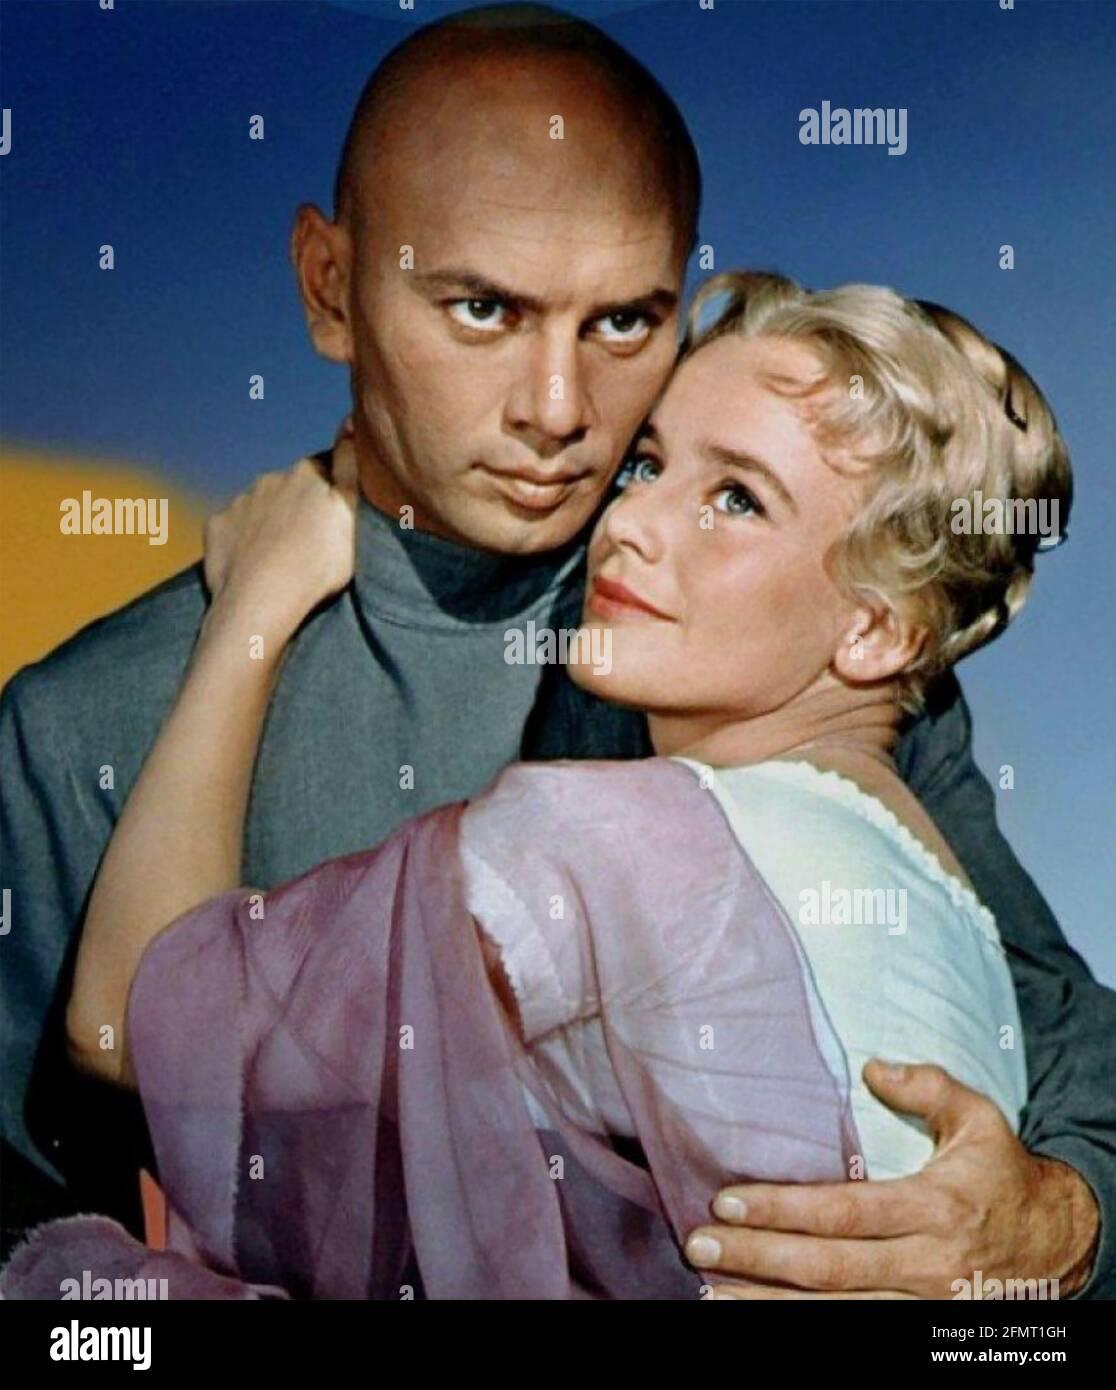 LES FRÈRES KARAMAZOV 1958 MGM film avec YUL Brynner AS Dimitri et Maria Schell comme Grushenka Banque D'Images